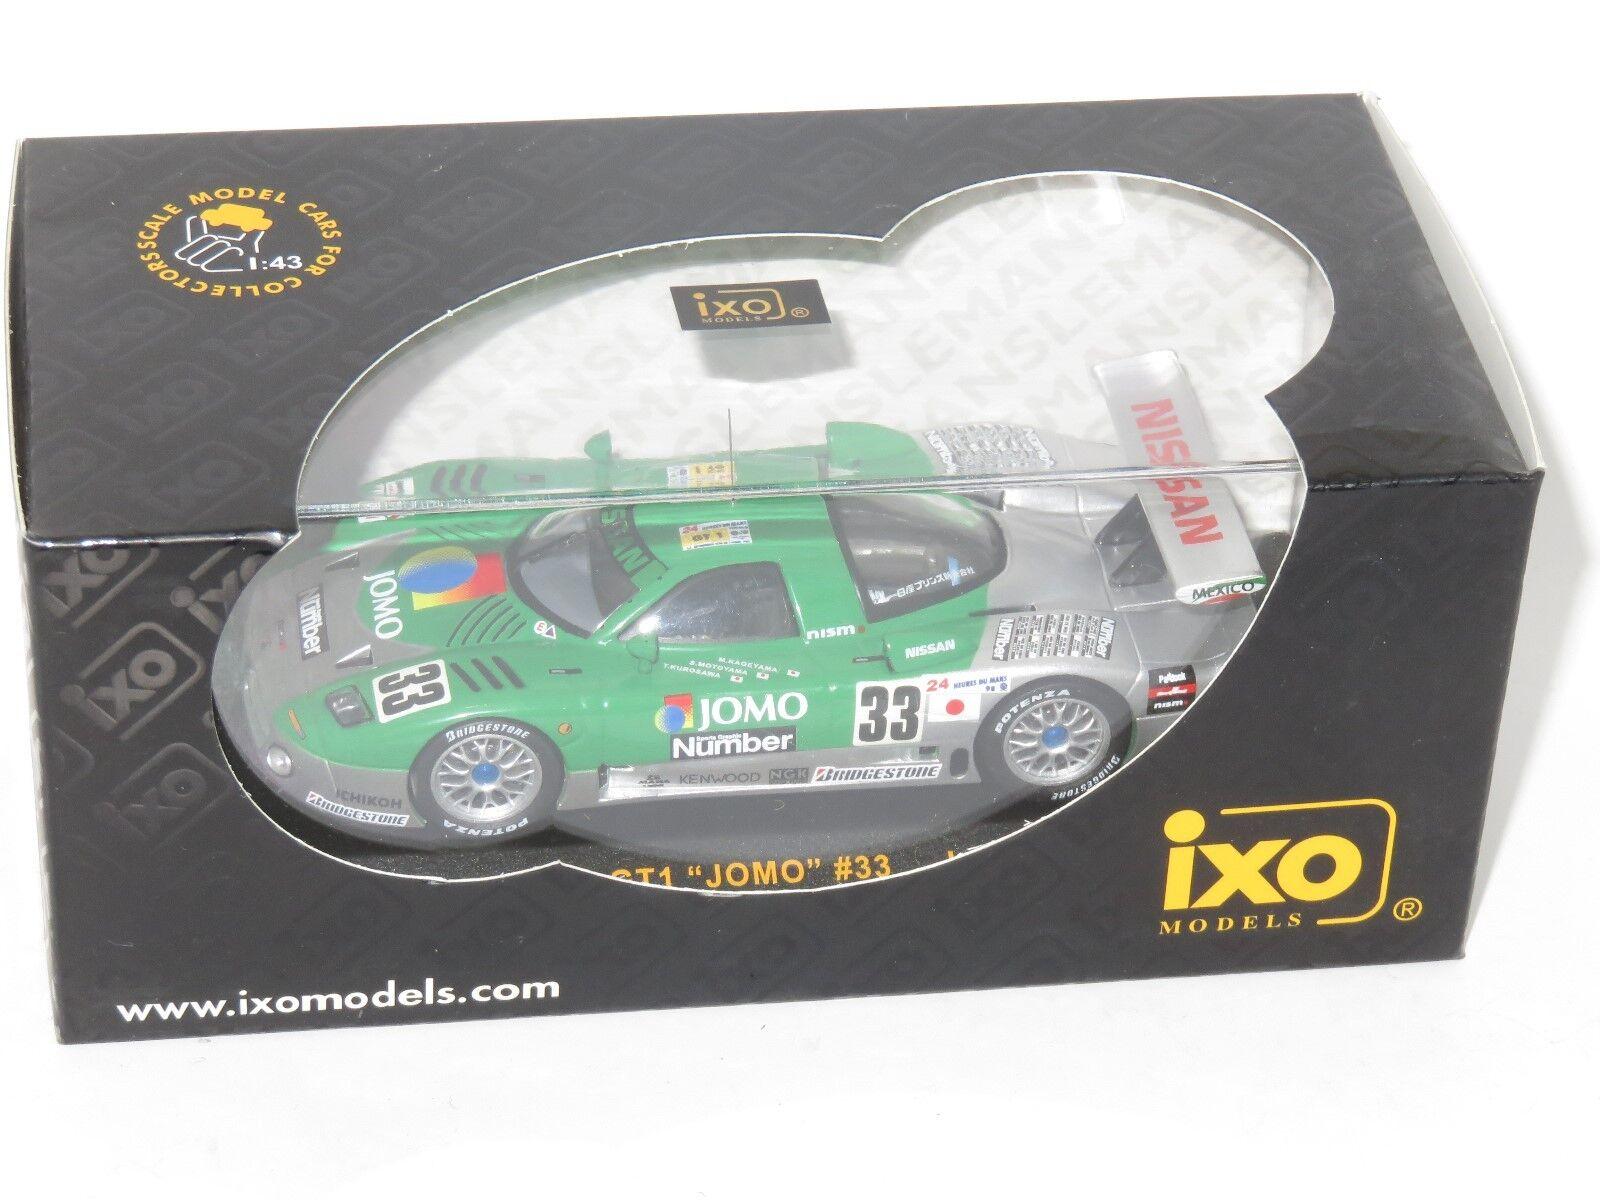 1/43 NISSAN R390 GT1 Jomo NISSAN Motorsports LE MANS 24 ore 1998  33